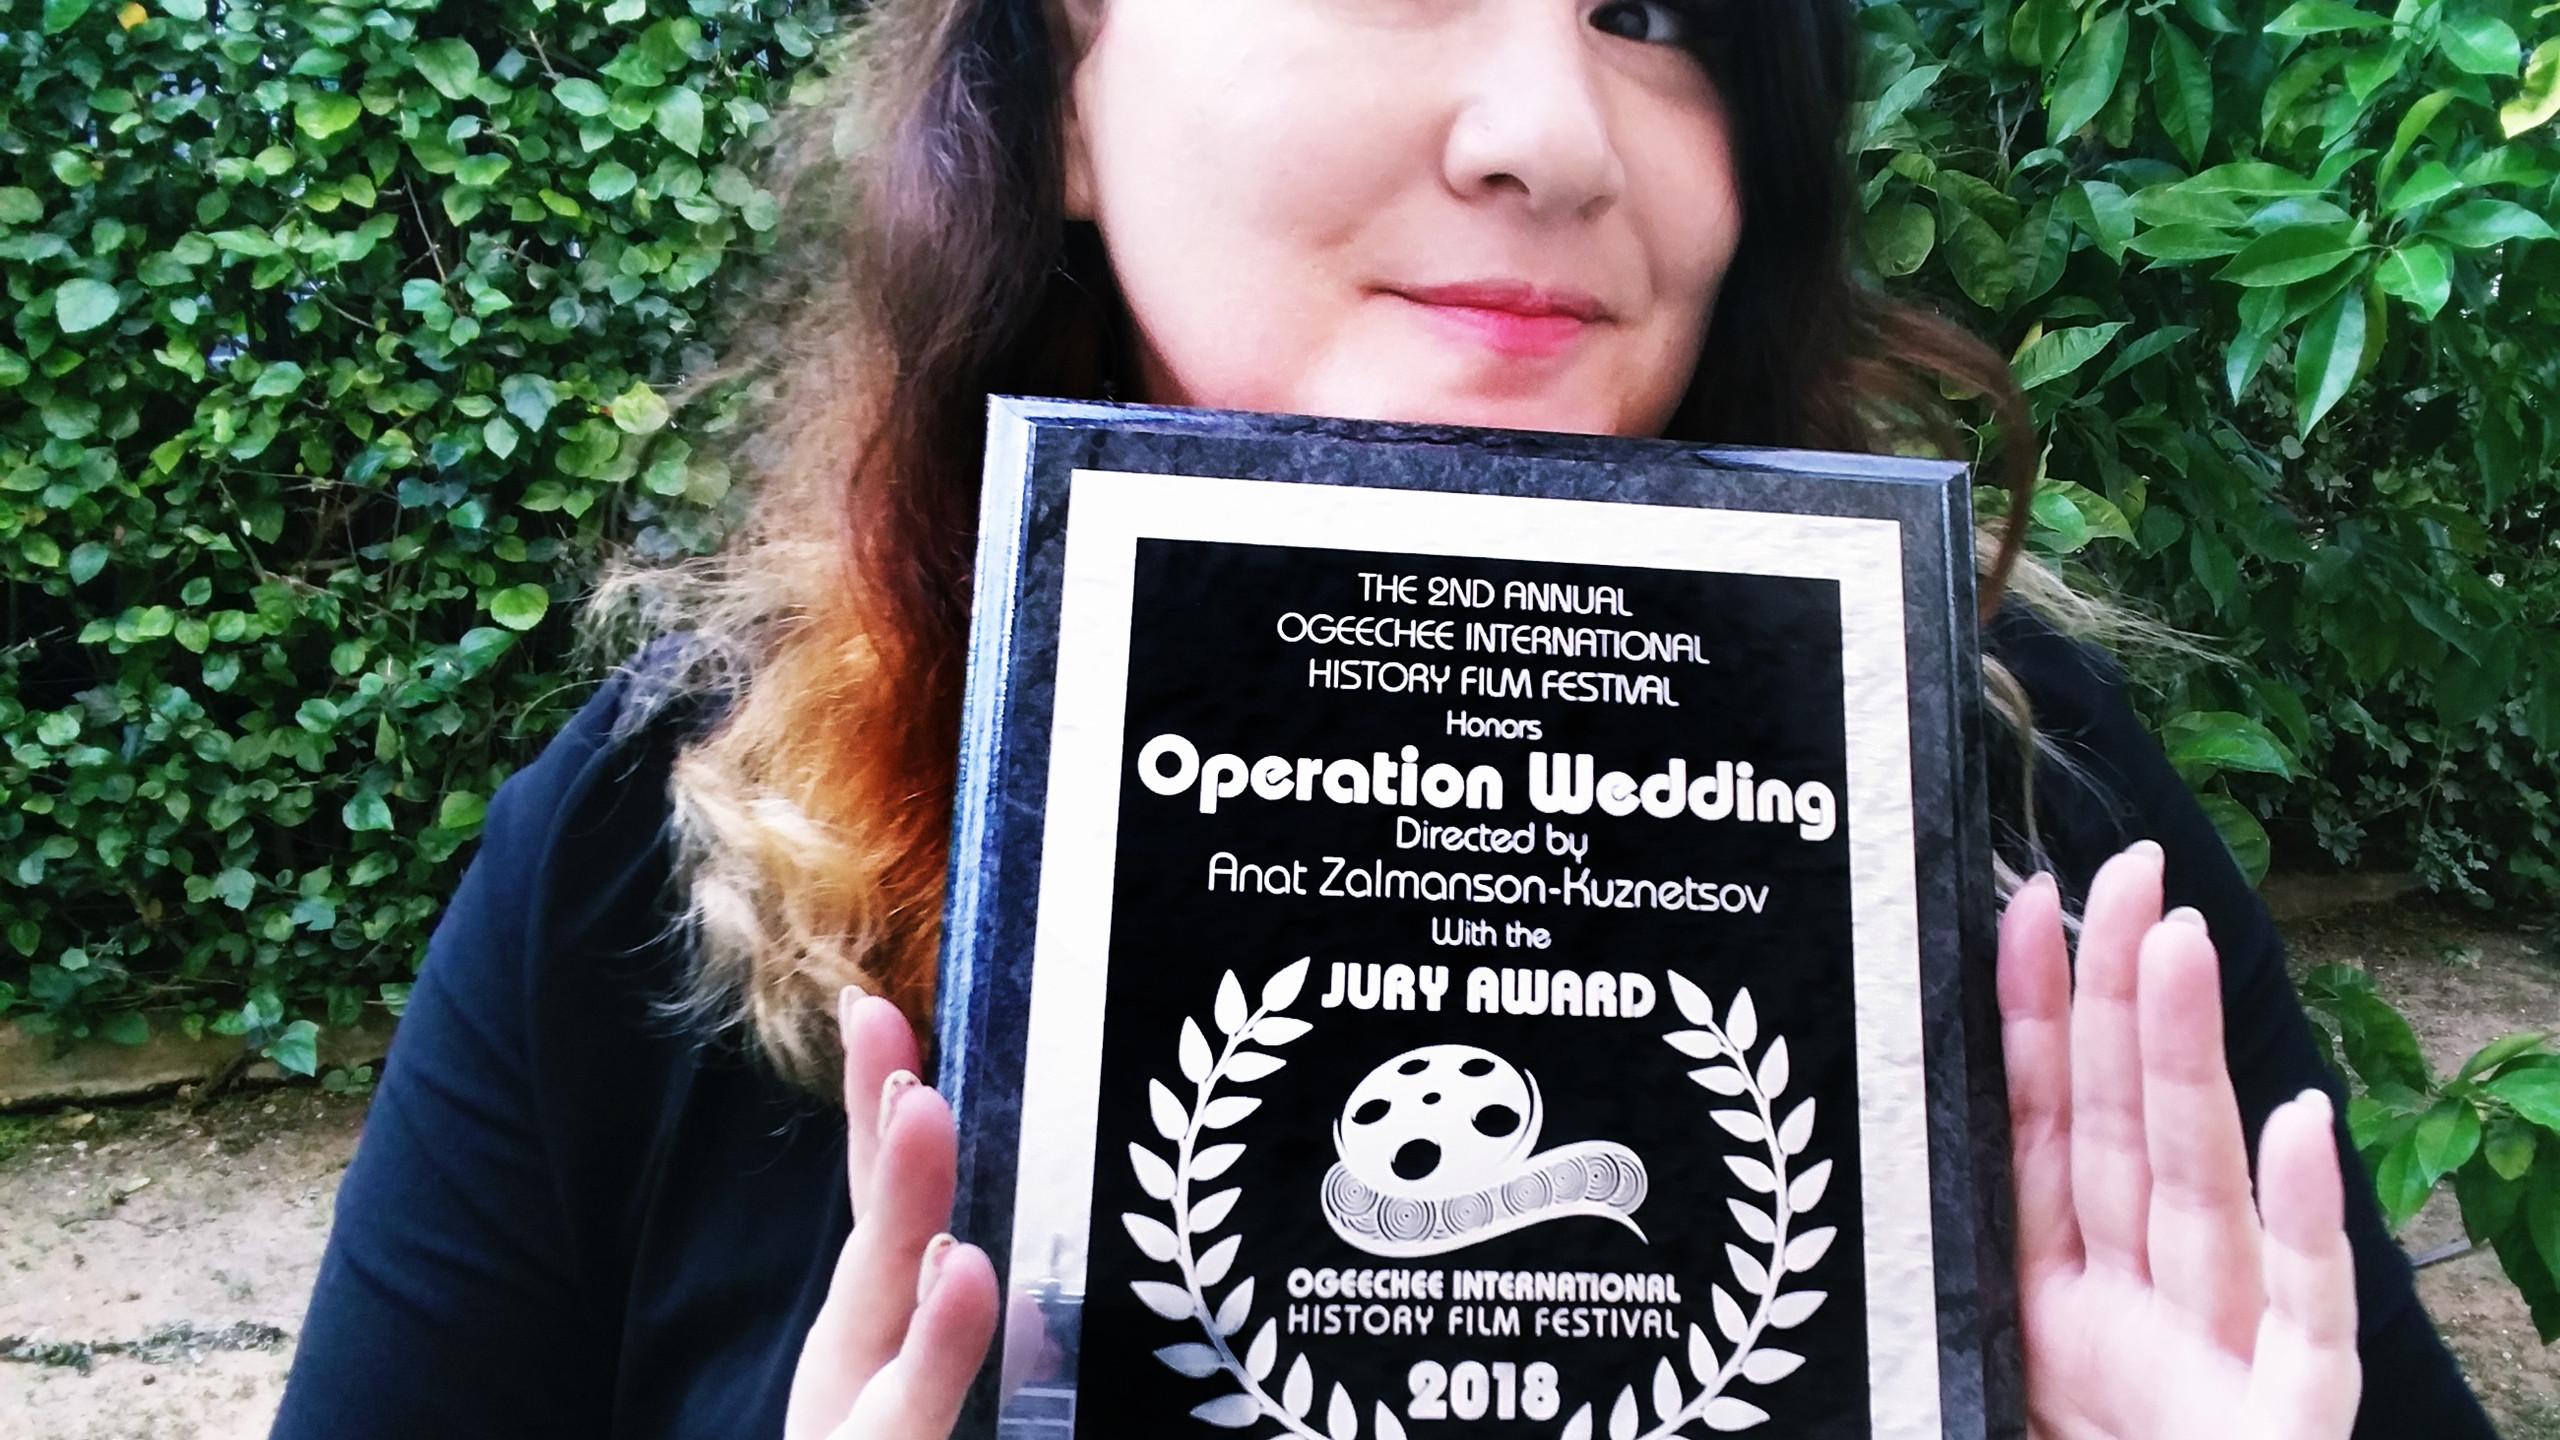 Award History film festival anat zalmans